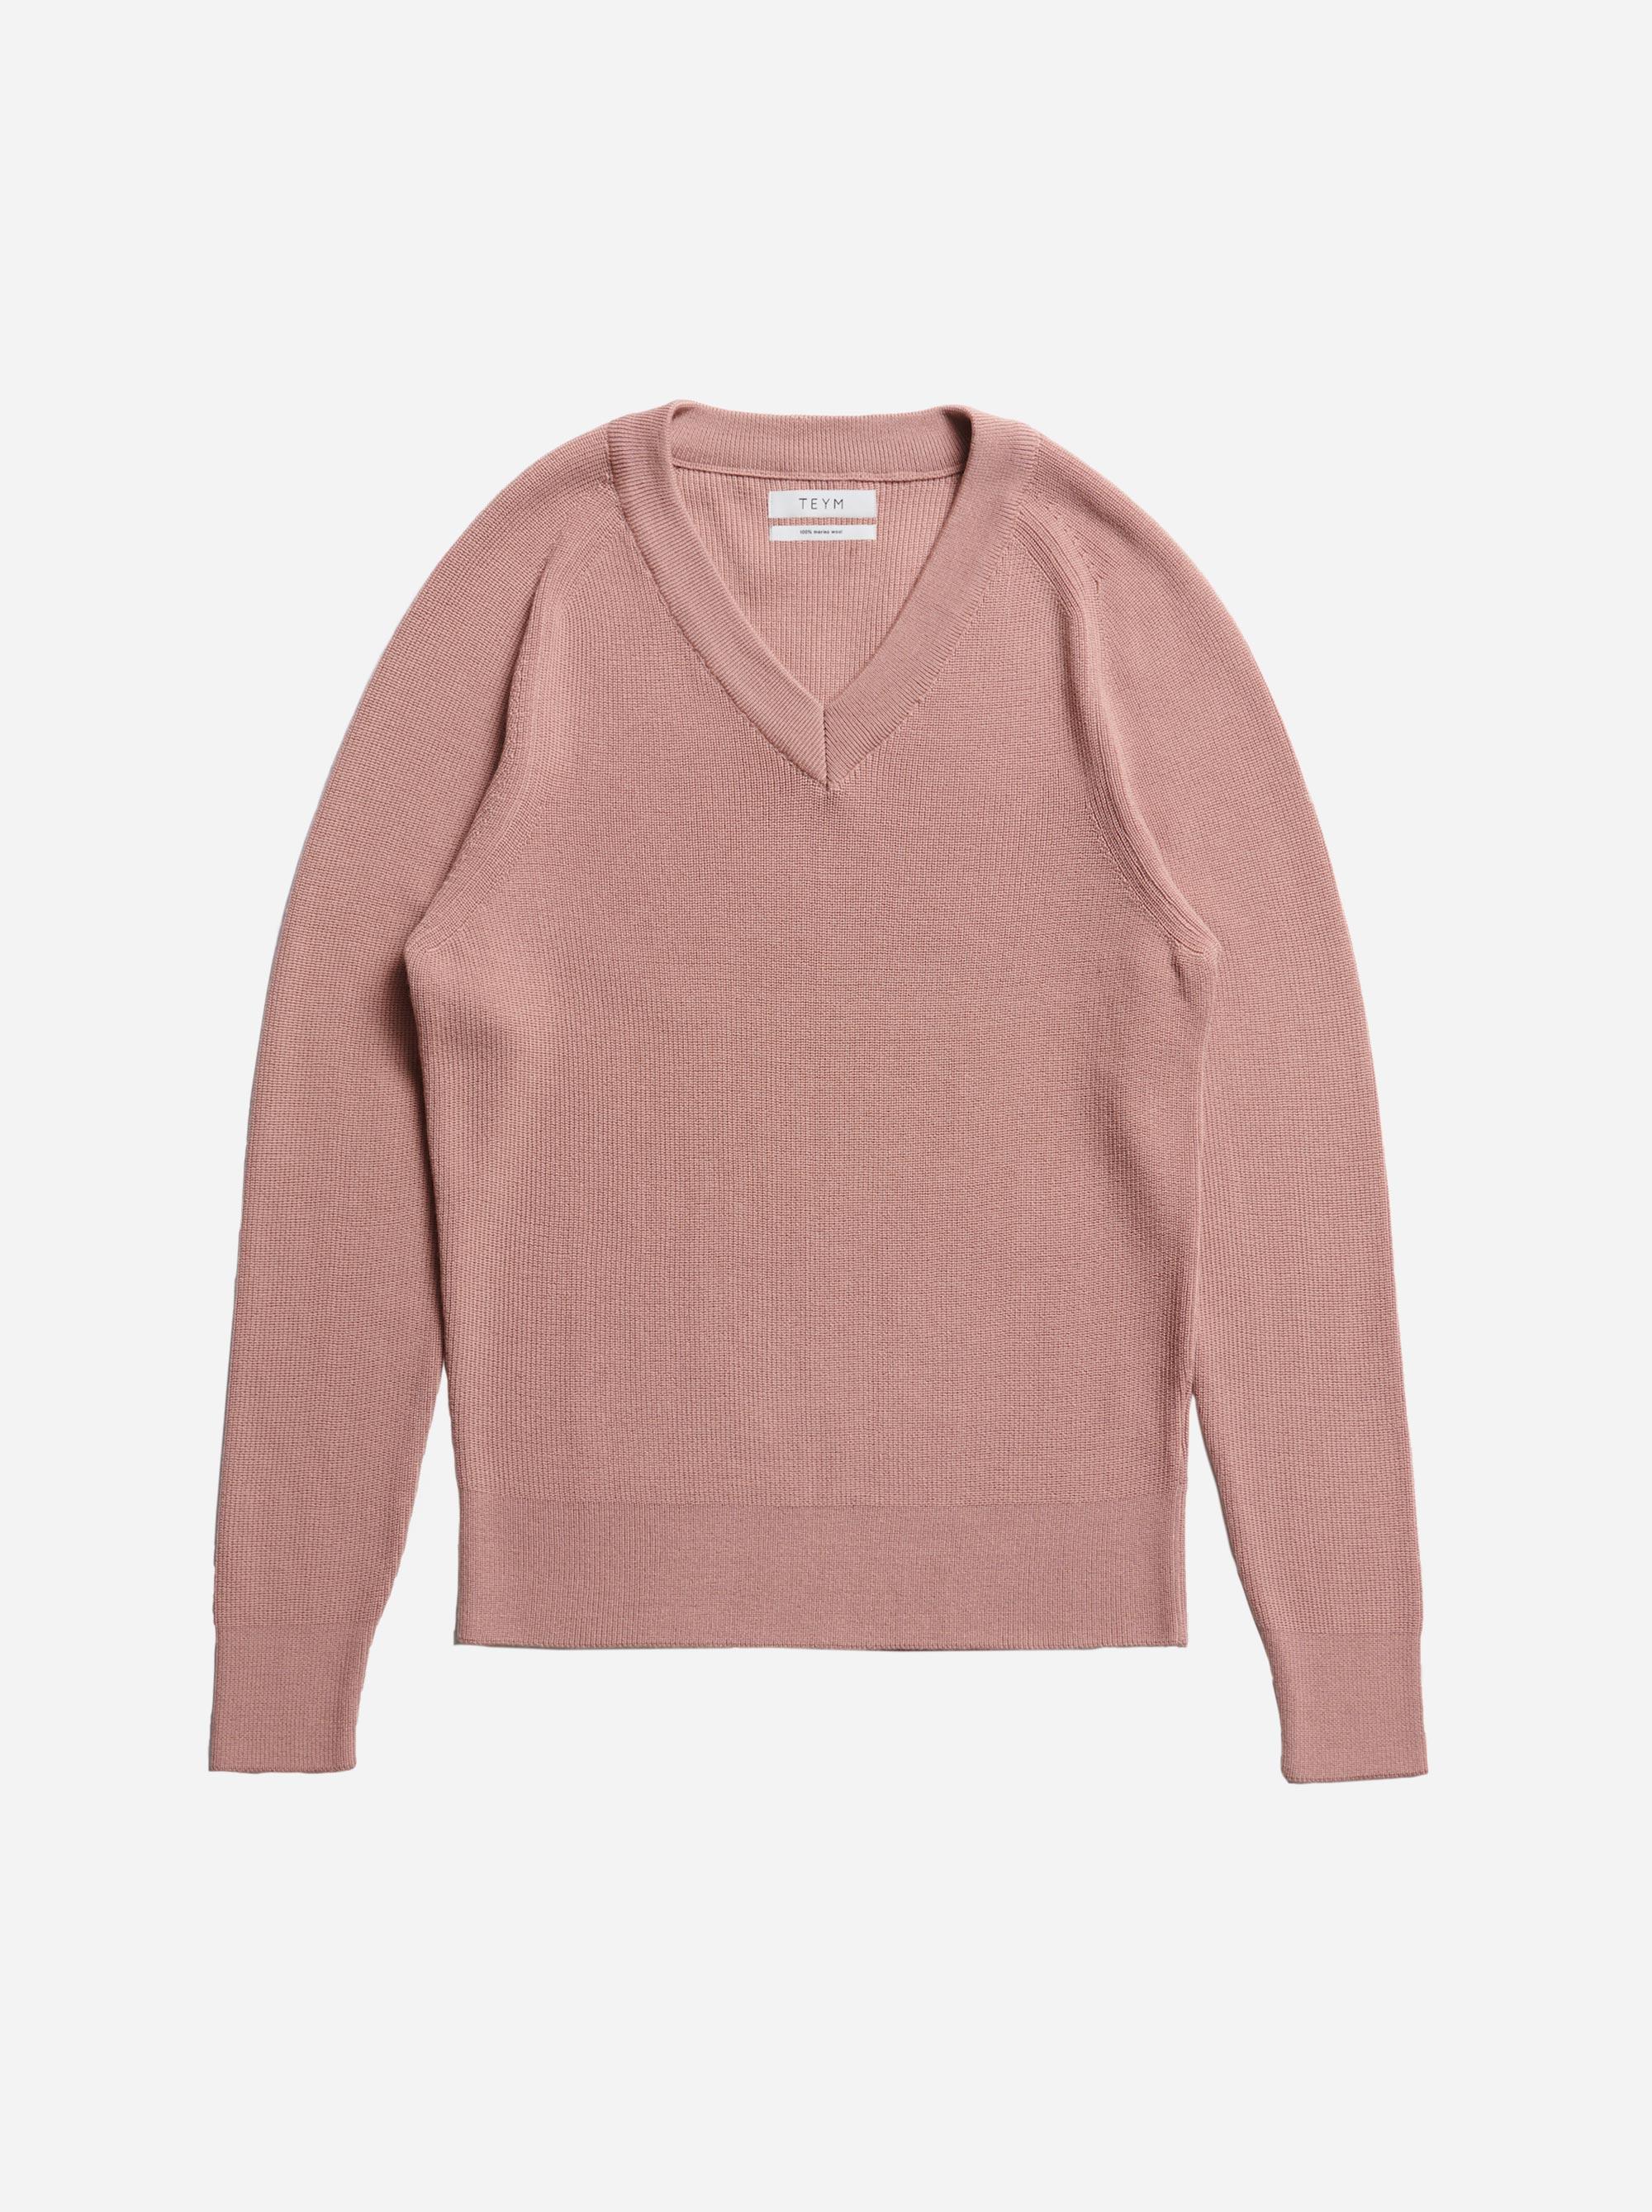 Teym - V-Neck - The Merino Sweater - Men - Pink - 5